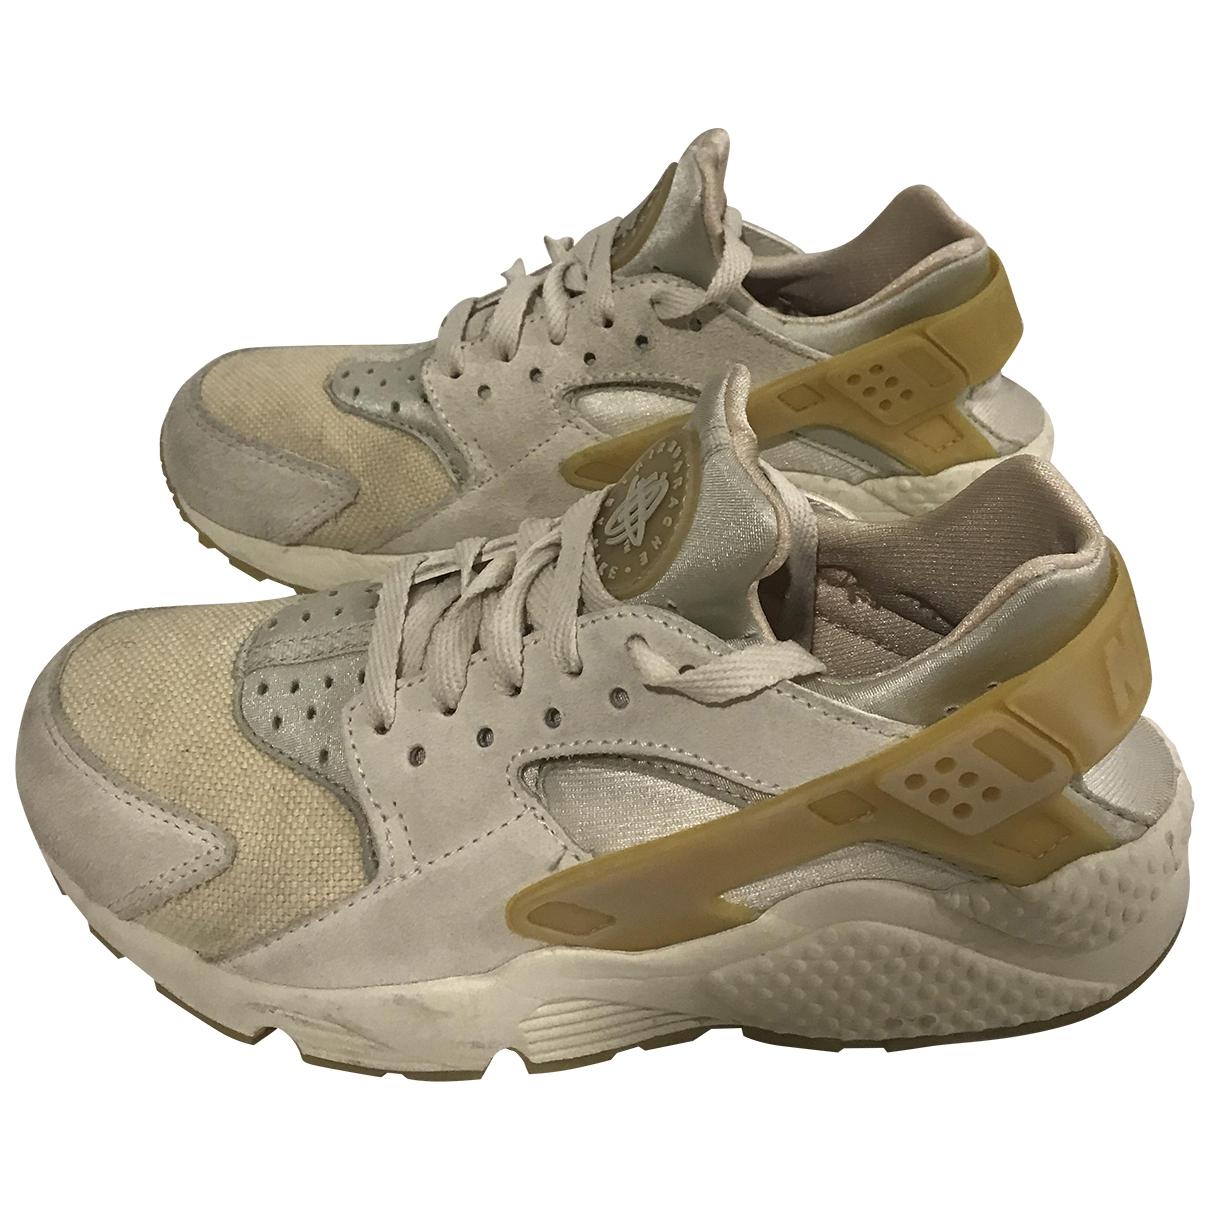 Nike - Baskets Huarache pour femme en suede - beige